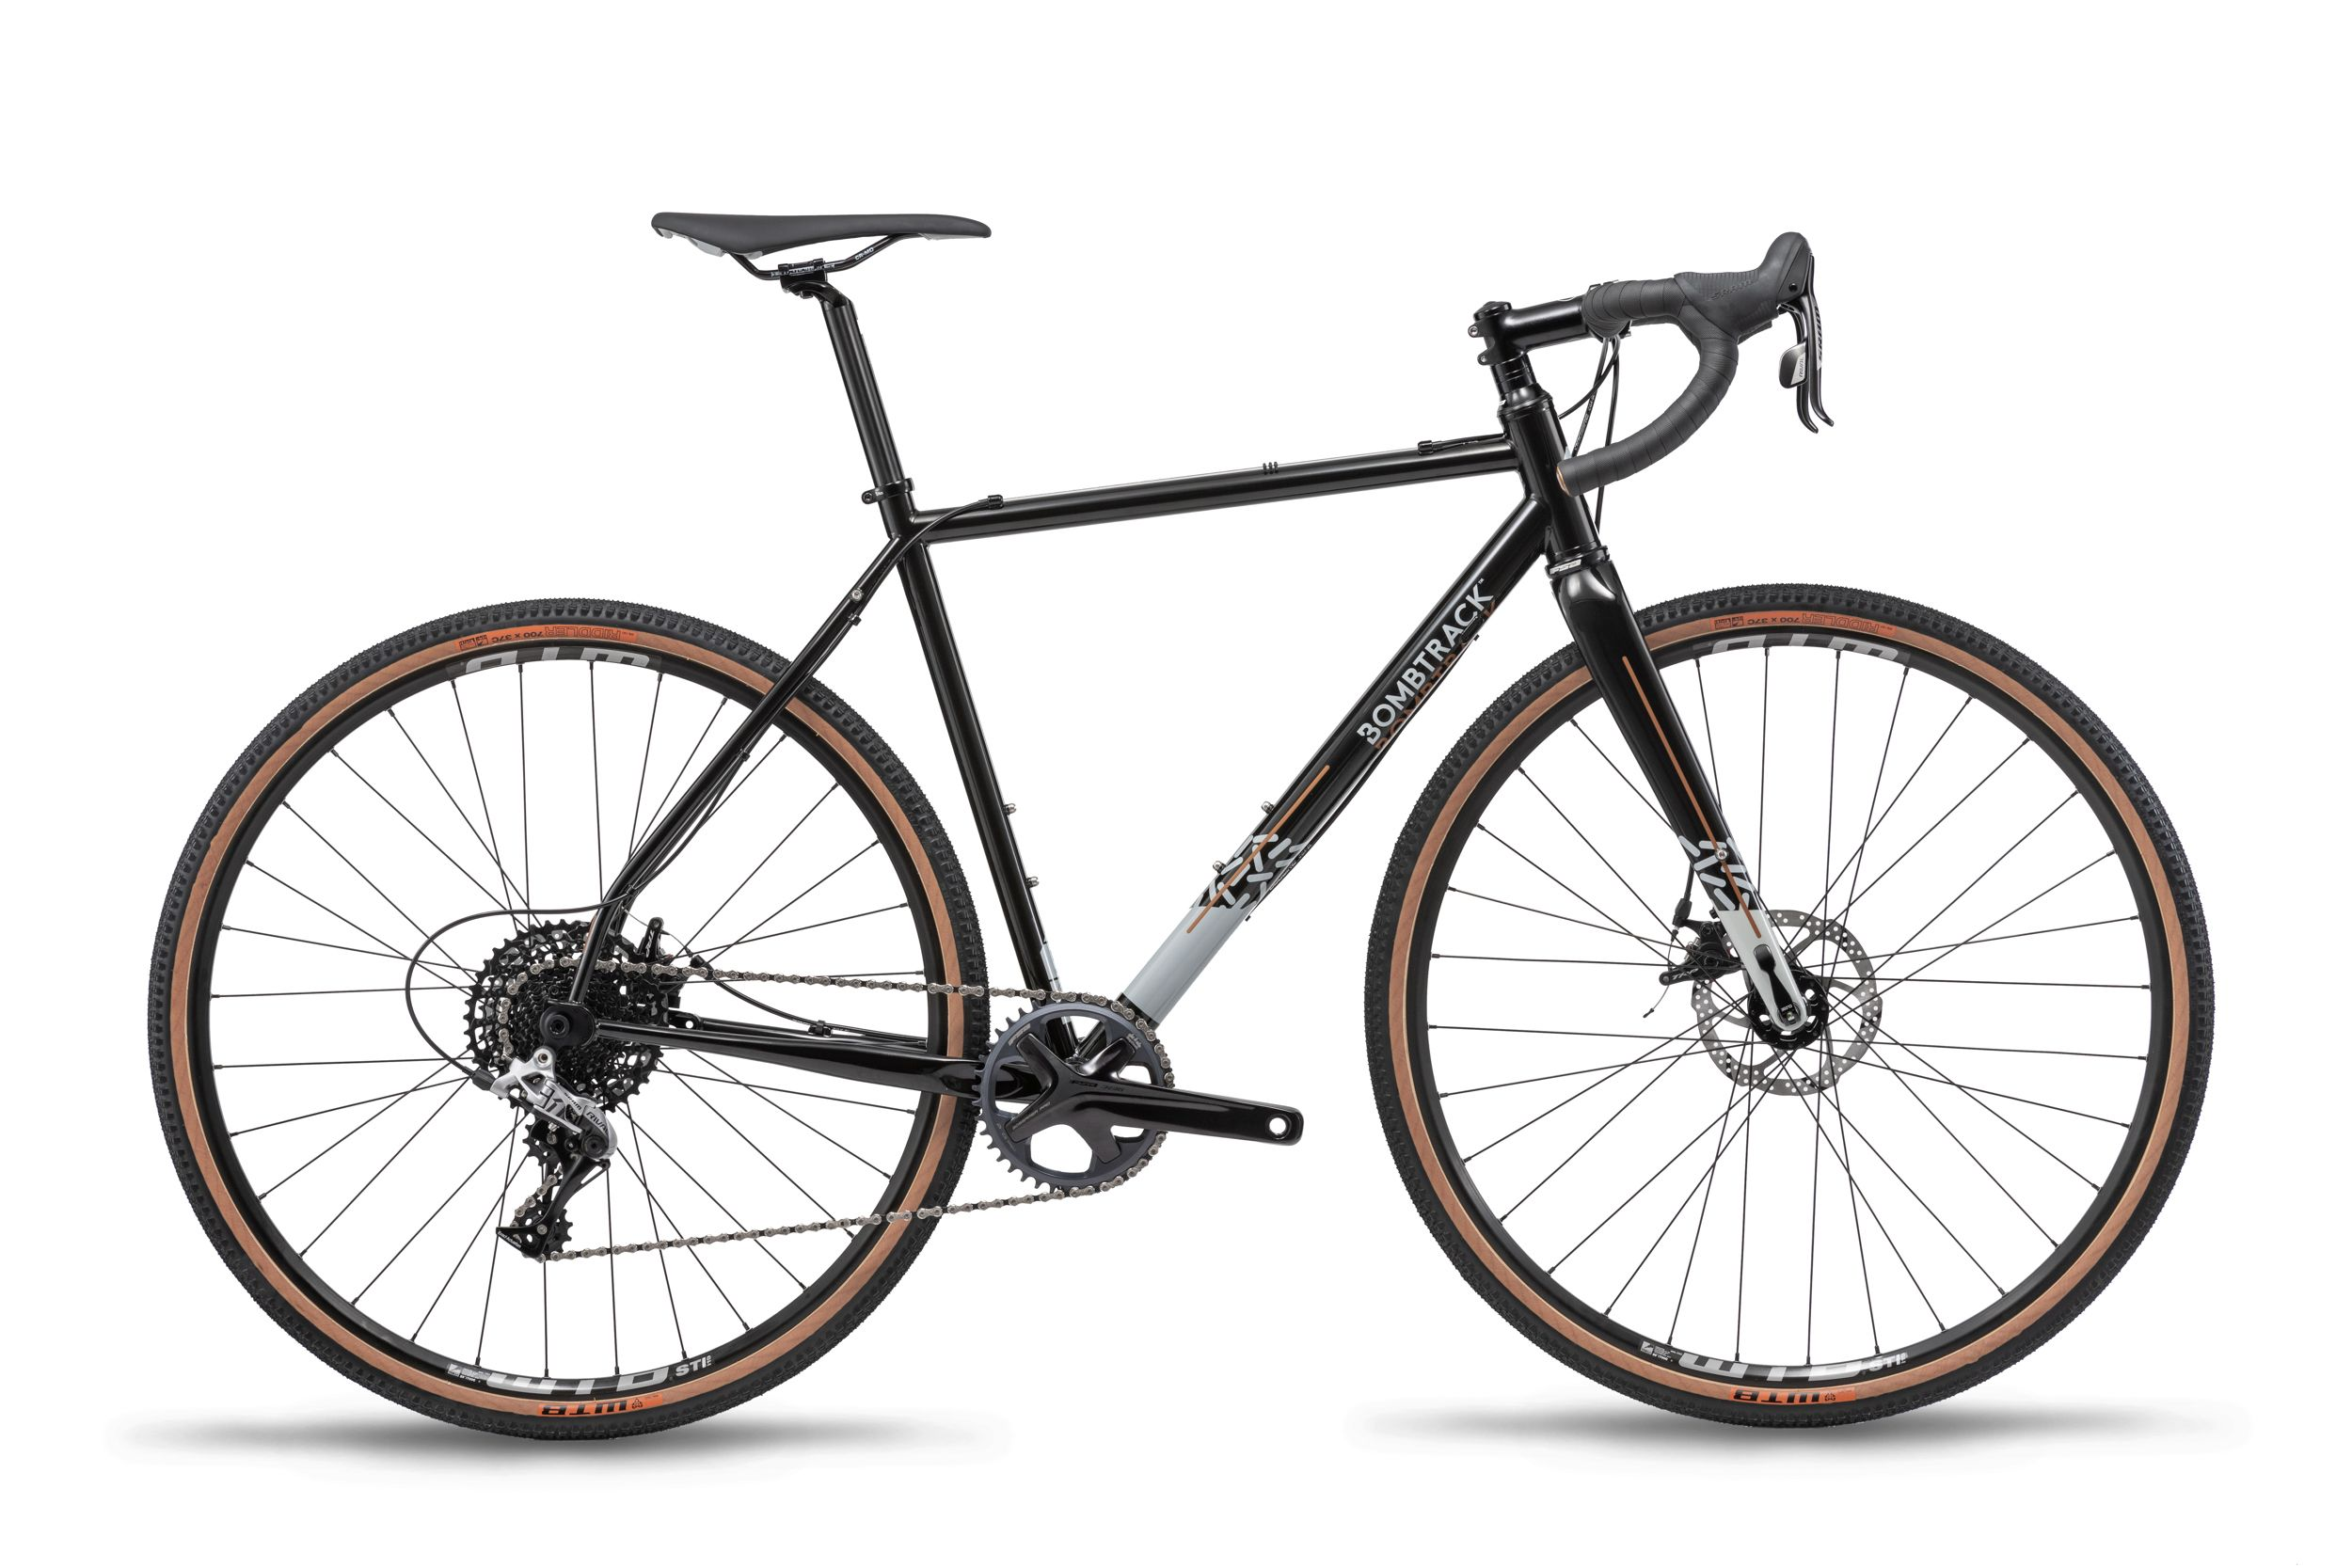 Bombtrack Hook 2 All Road Bike 2019 | Road bikes